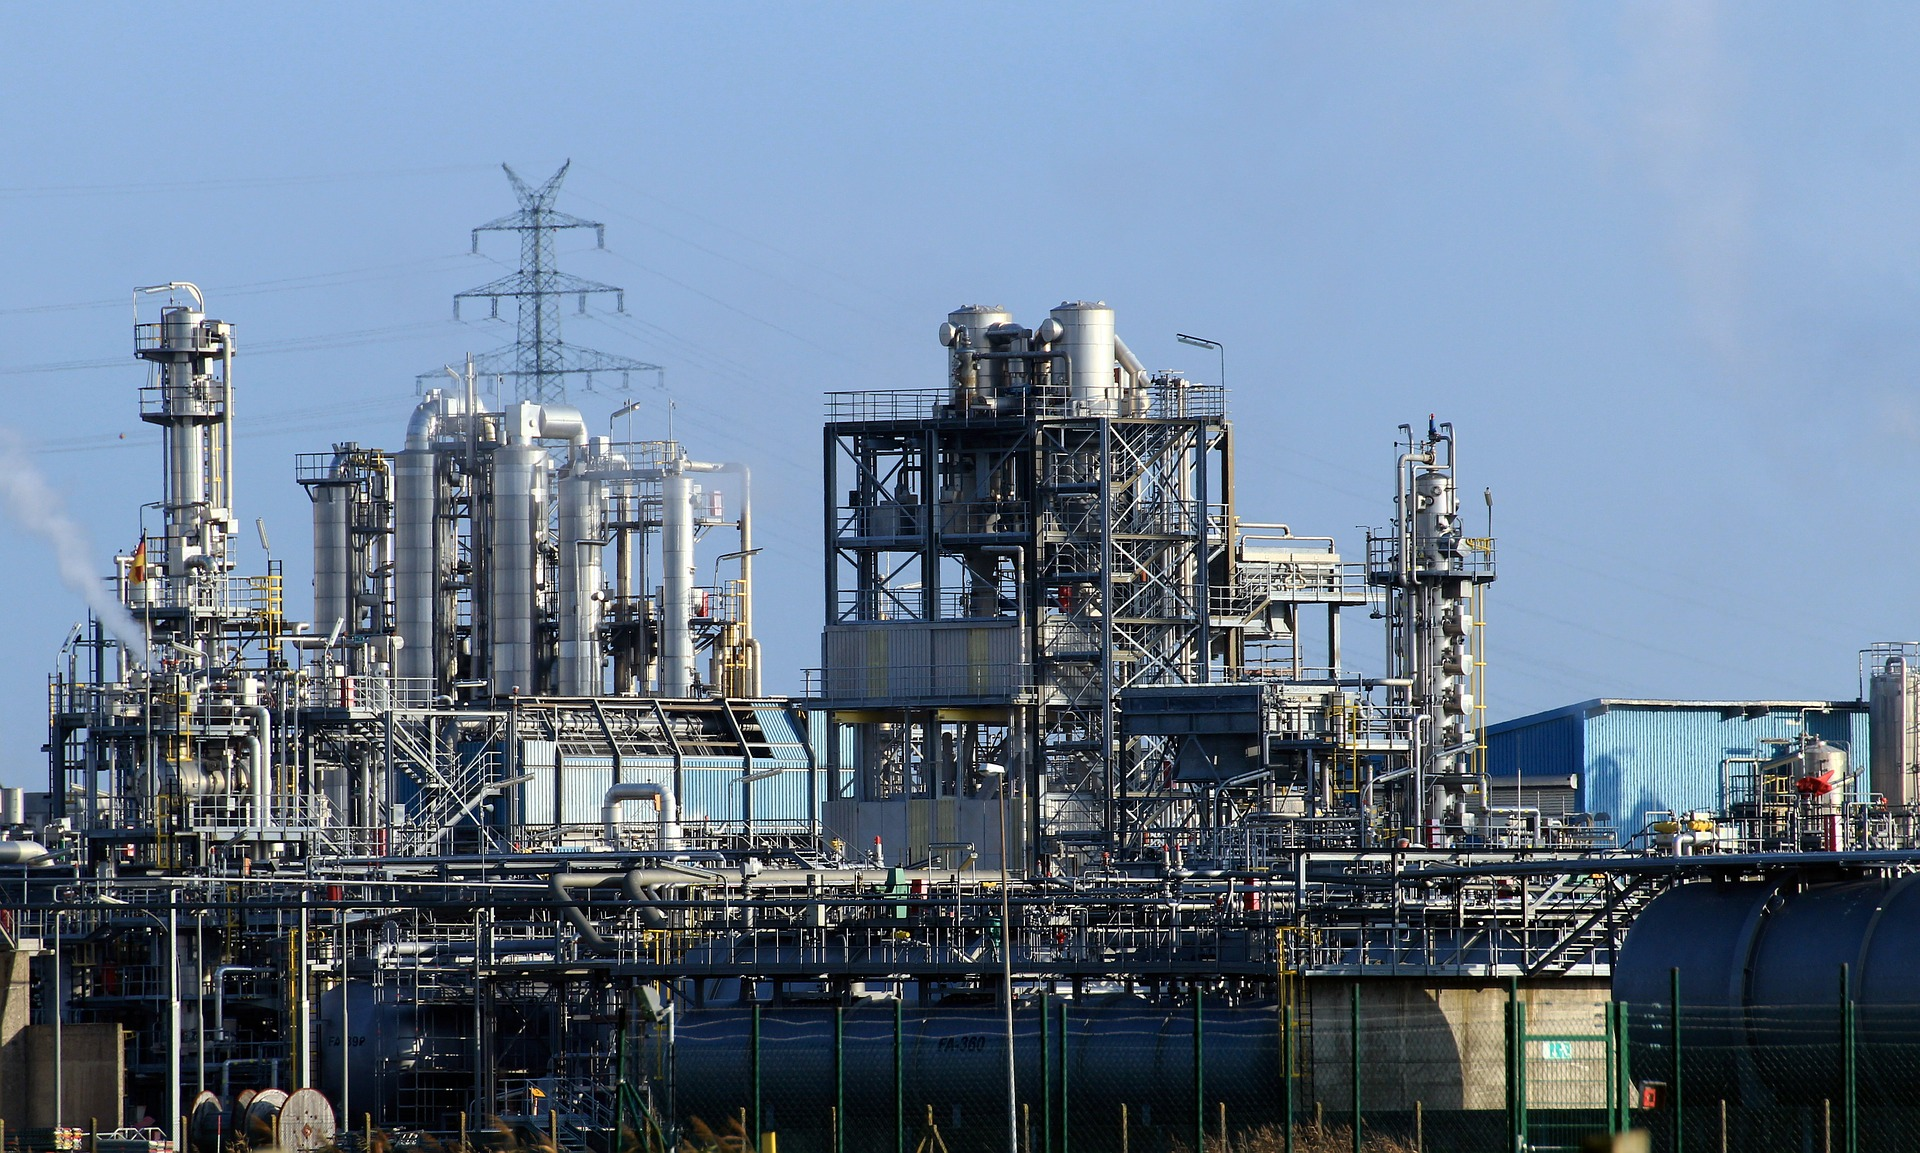 CORC Refineria di Korsou Isla refinery